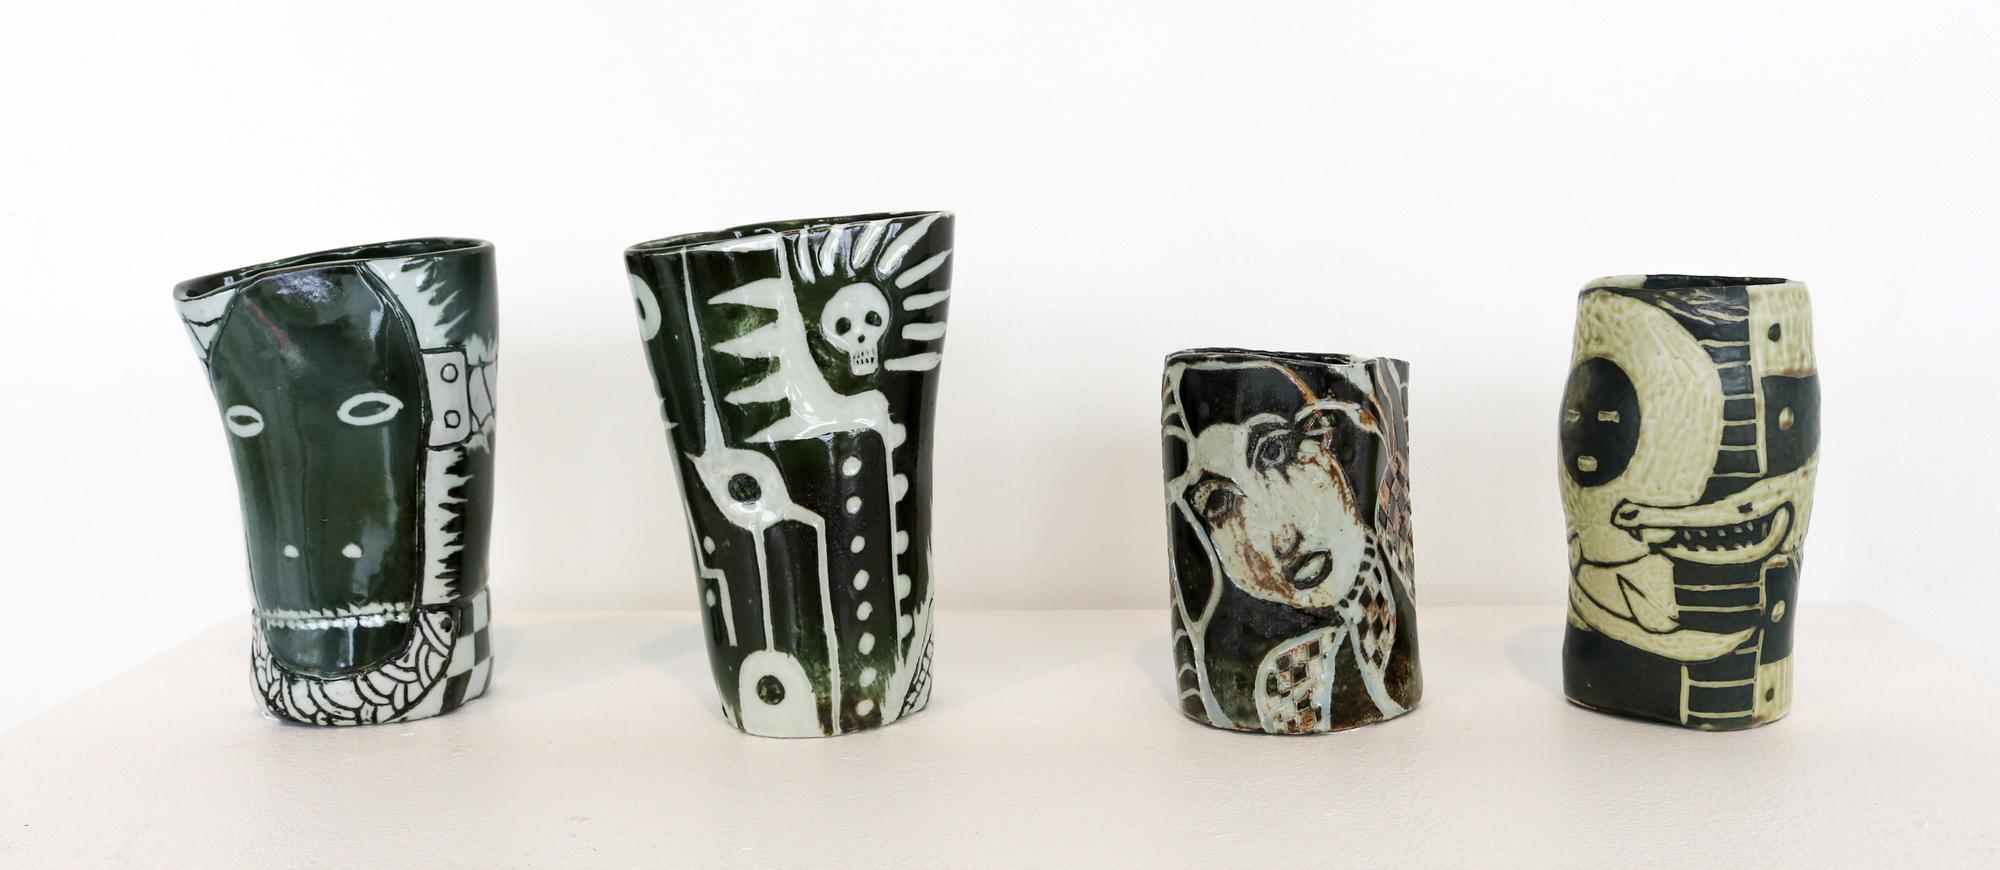 Ceramic vessels by James Keller